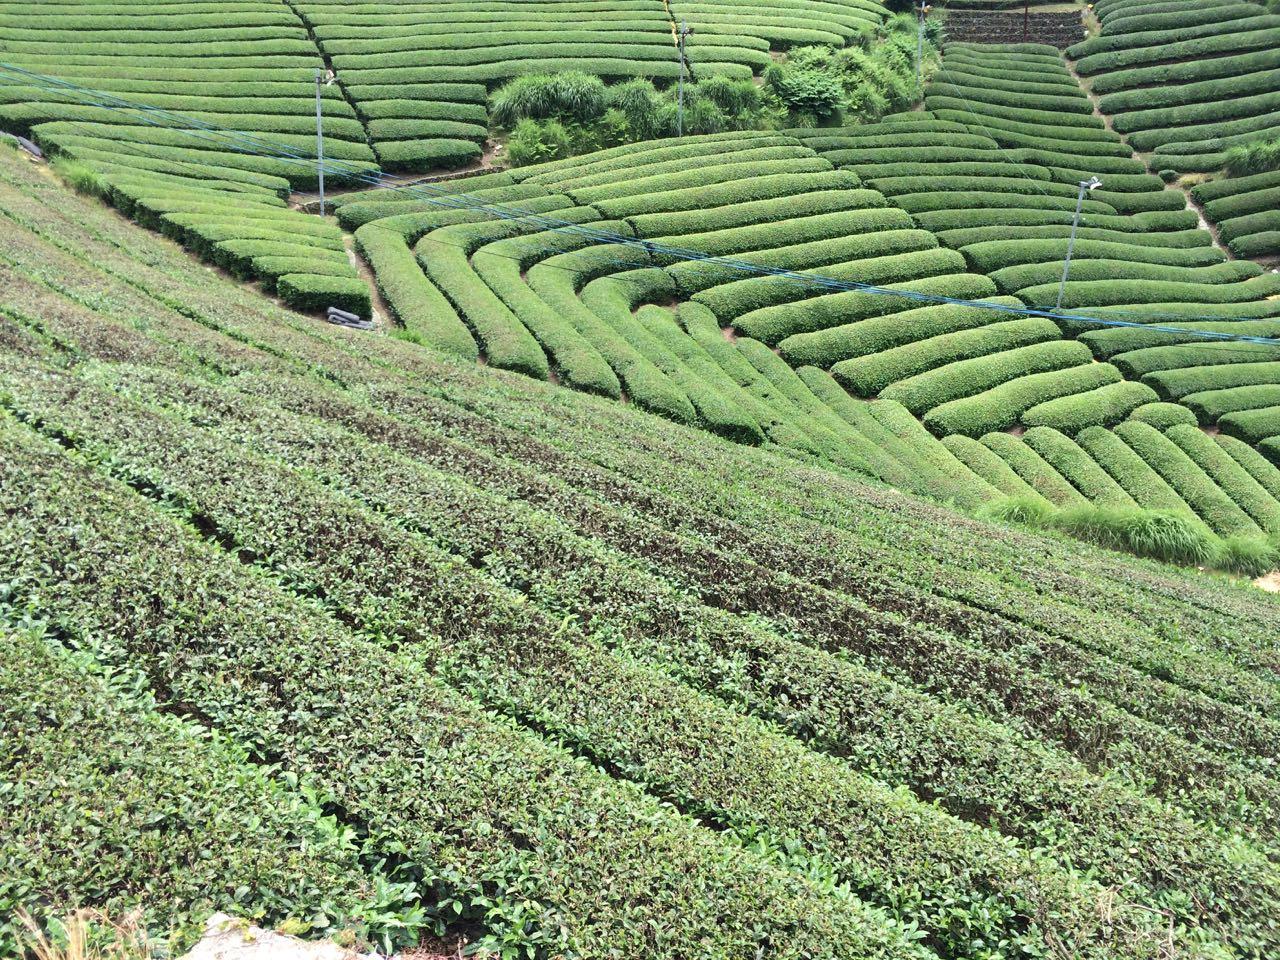 Tea fields as far as the eye can see